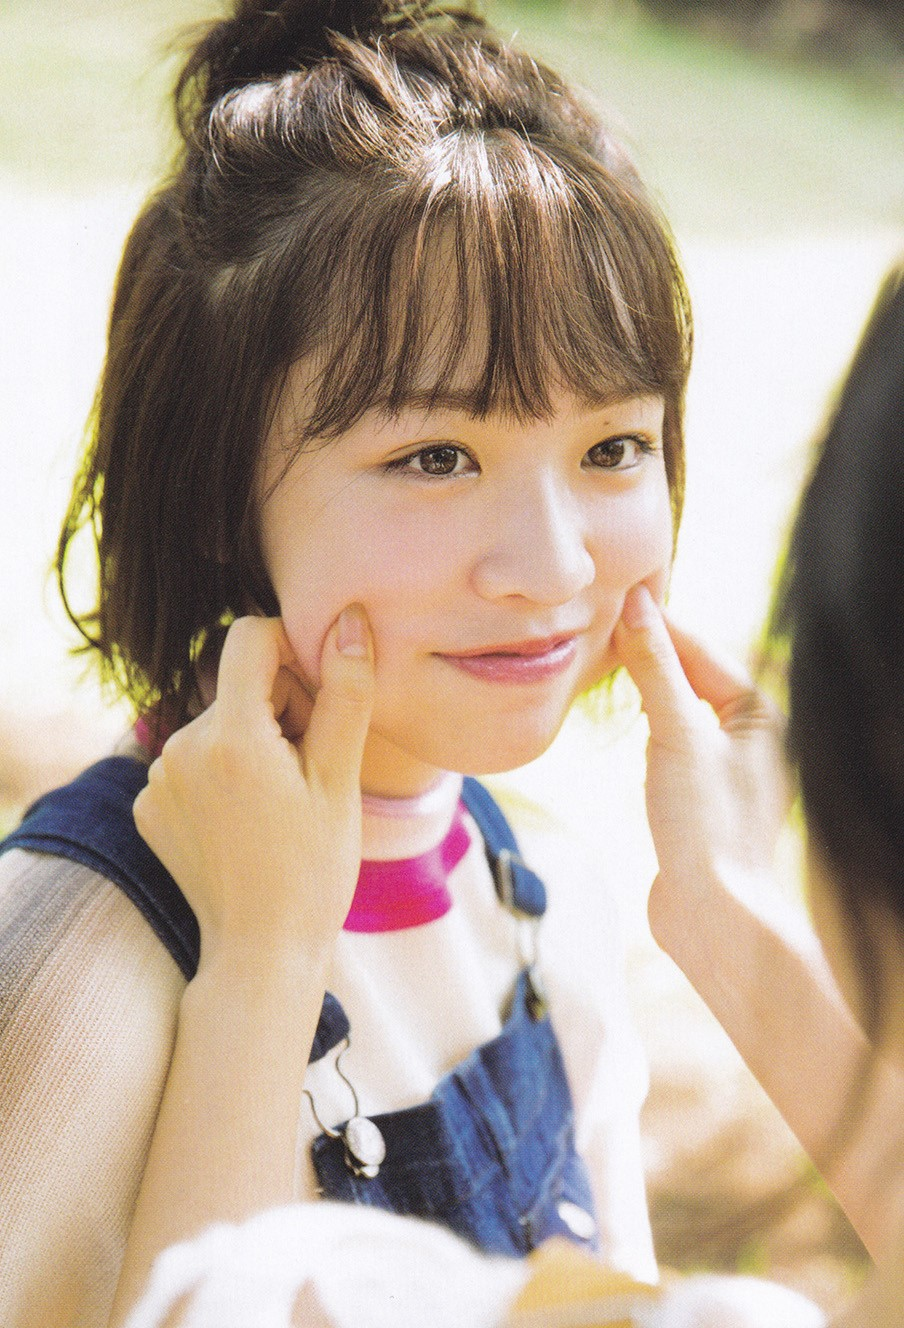 Terada Ranze 寺田蘭世, Watanabe Miria 渡辺みり愛, B.L.T 2017年11月号